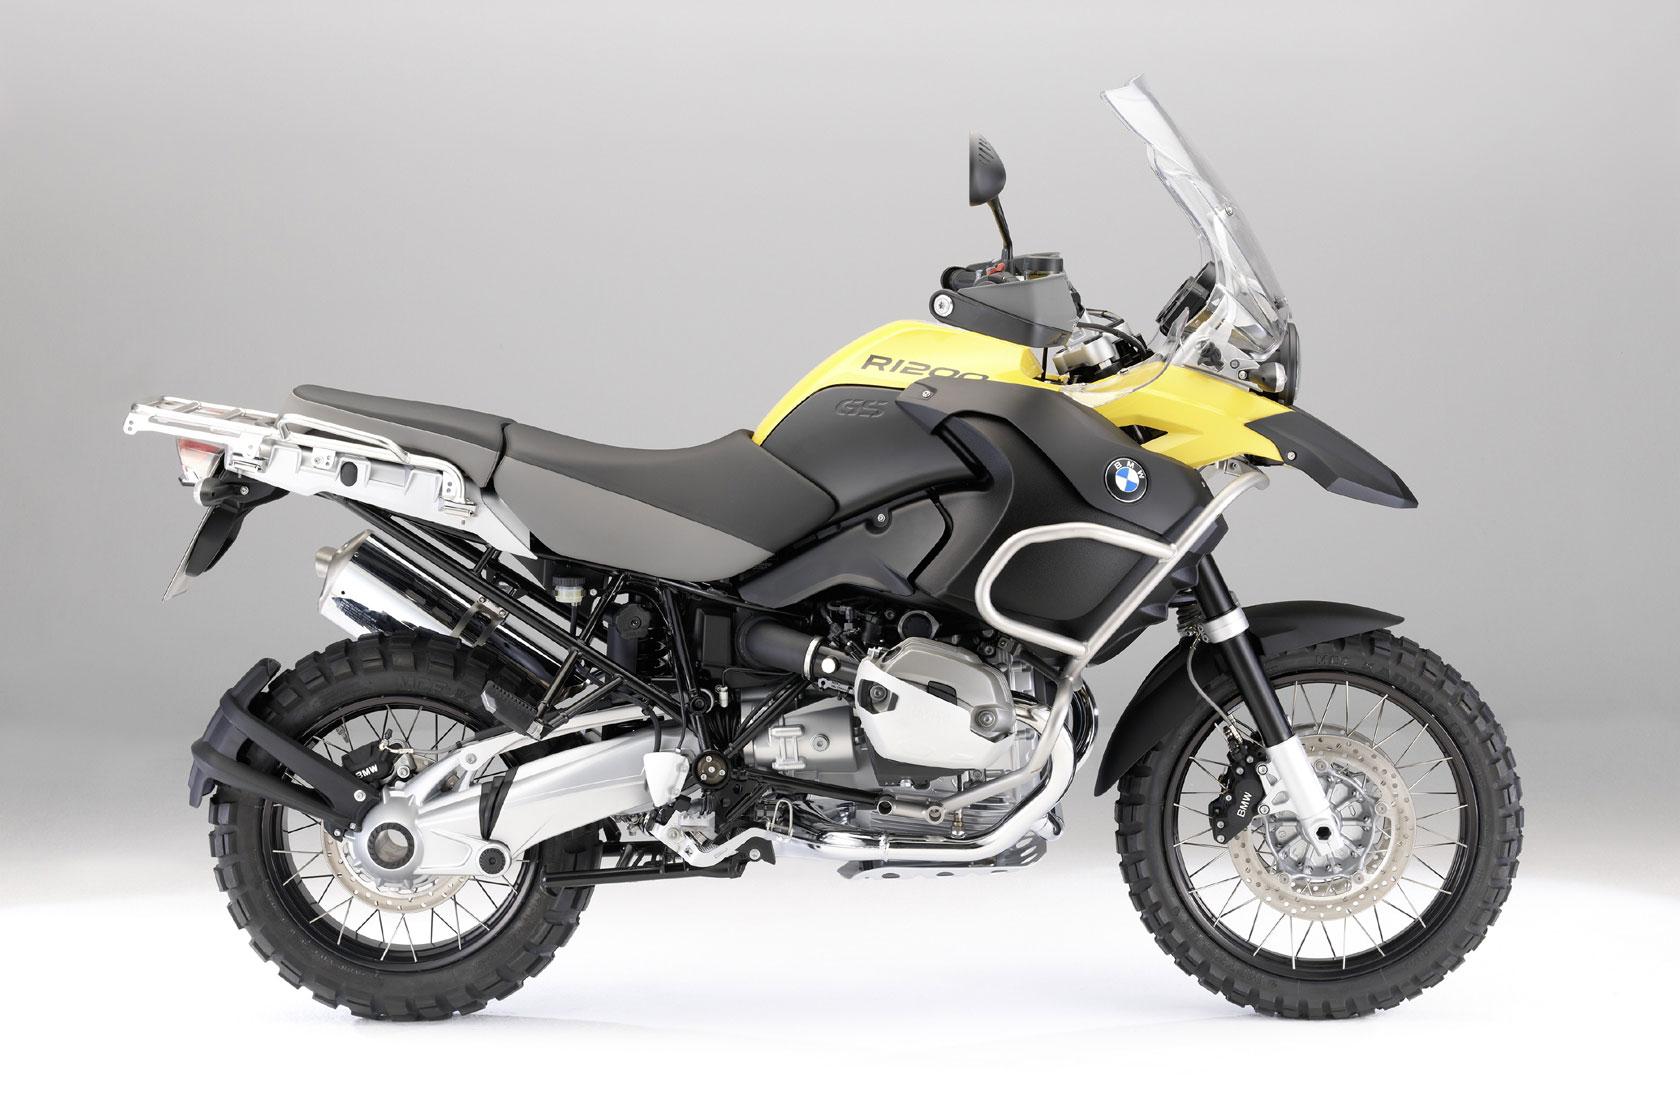 Http Servizi Bmw R 1200 Gs 2017 08 Wiring Diagram S1000rr Ducati Multistrada 2010 R1200gsadventuree 1